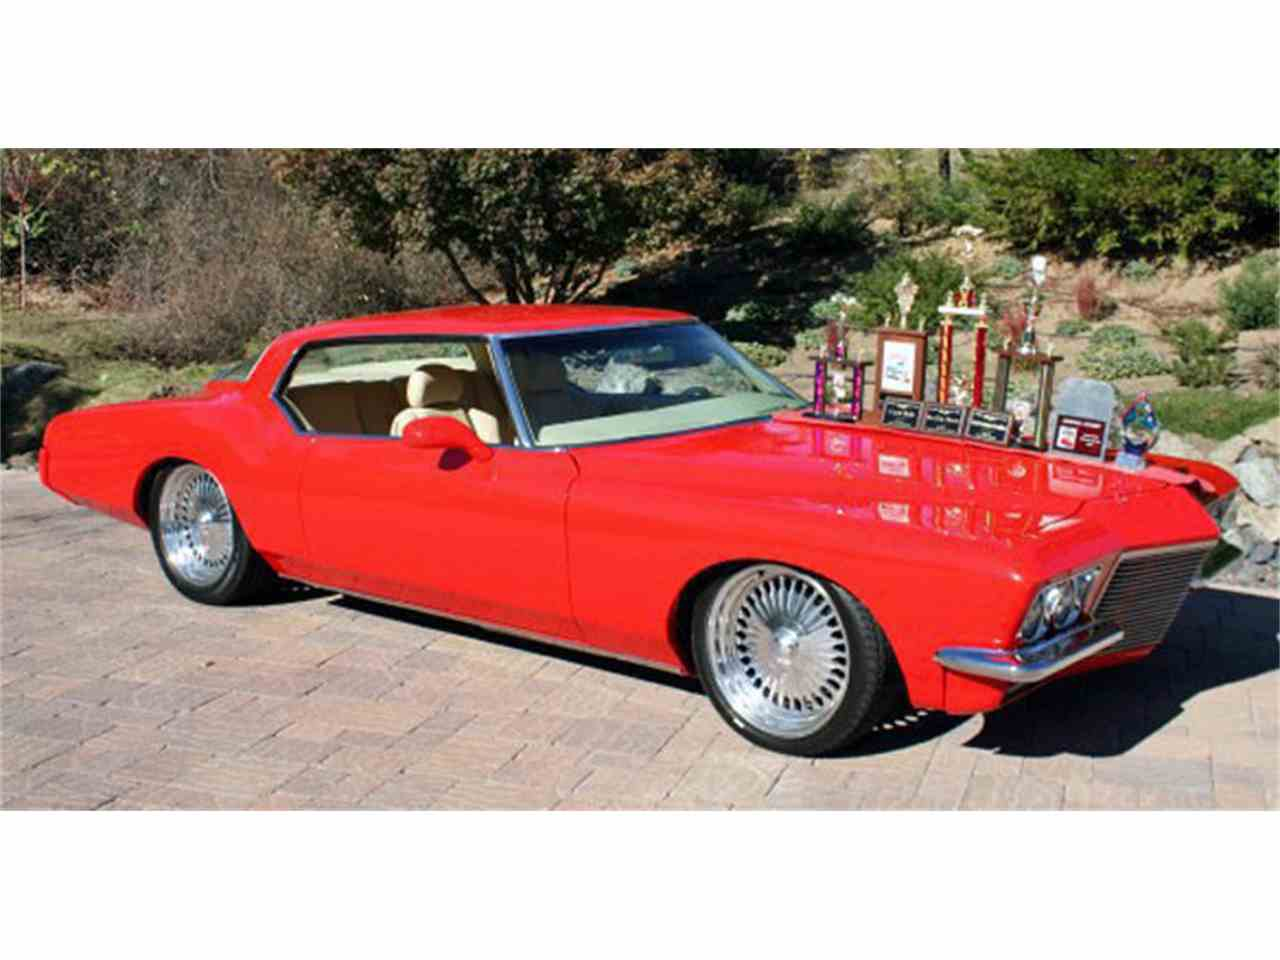 1971 Buick Riviera For Sale Classiccars Com Cc 1073729